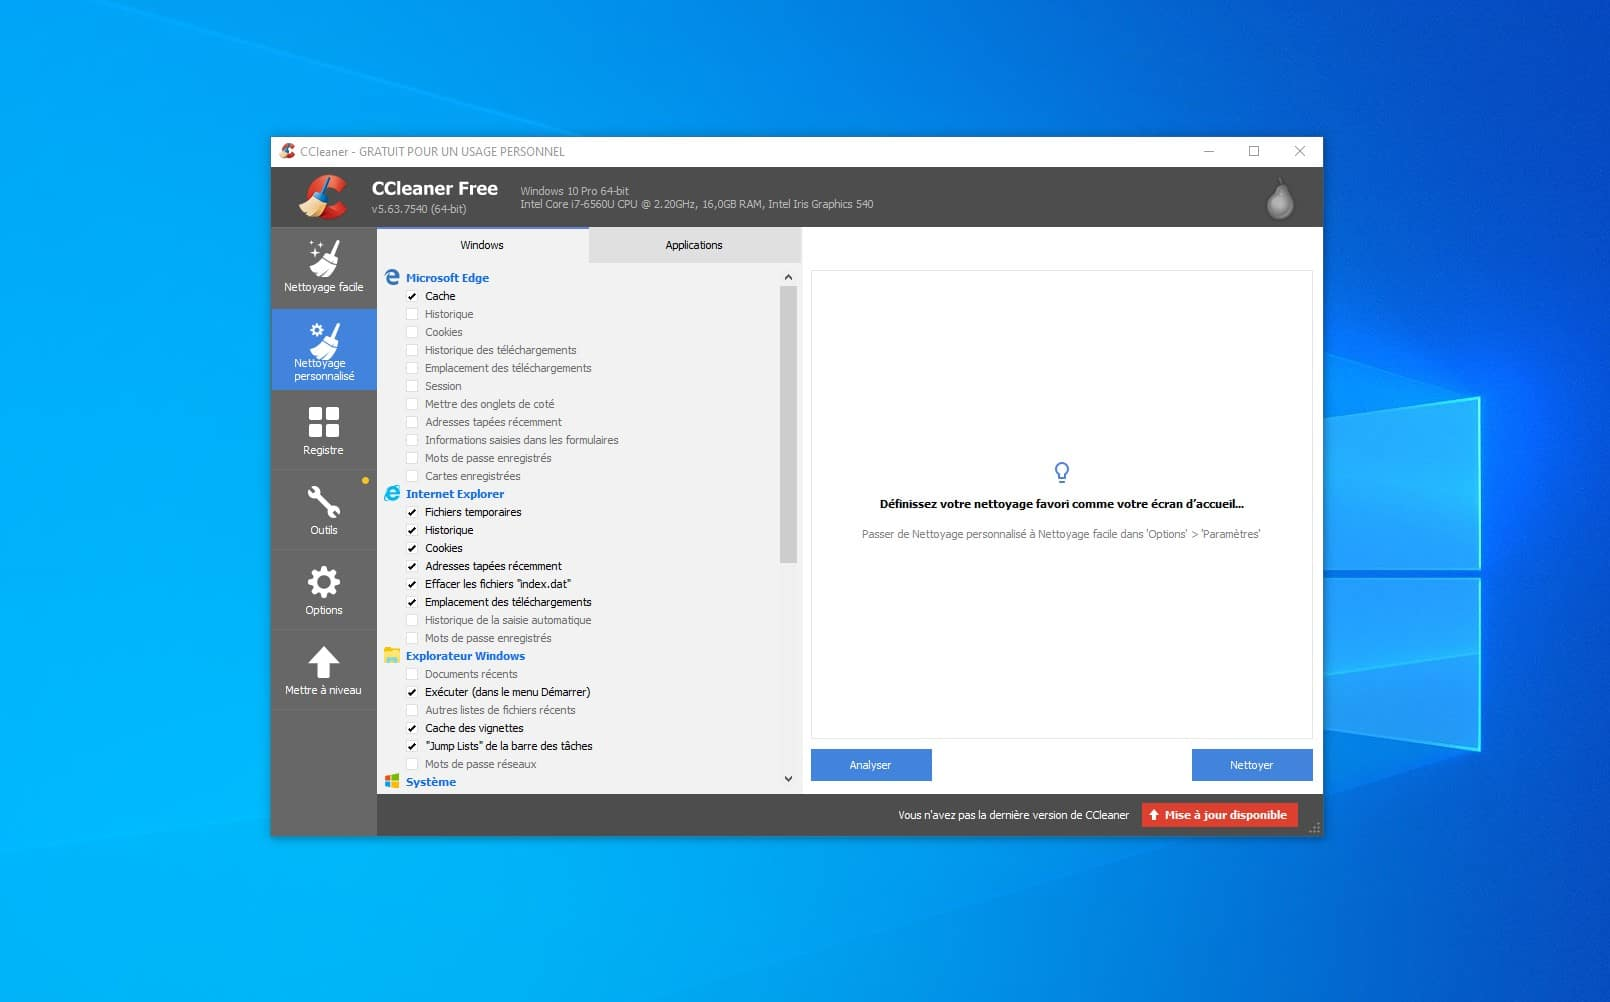 Windows 10 CCleaner